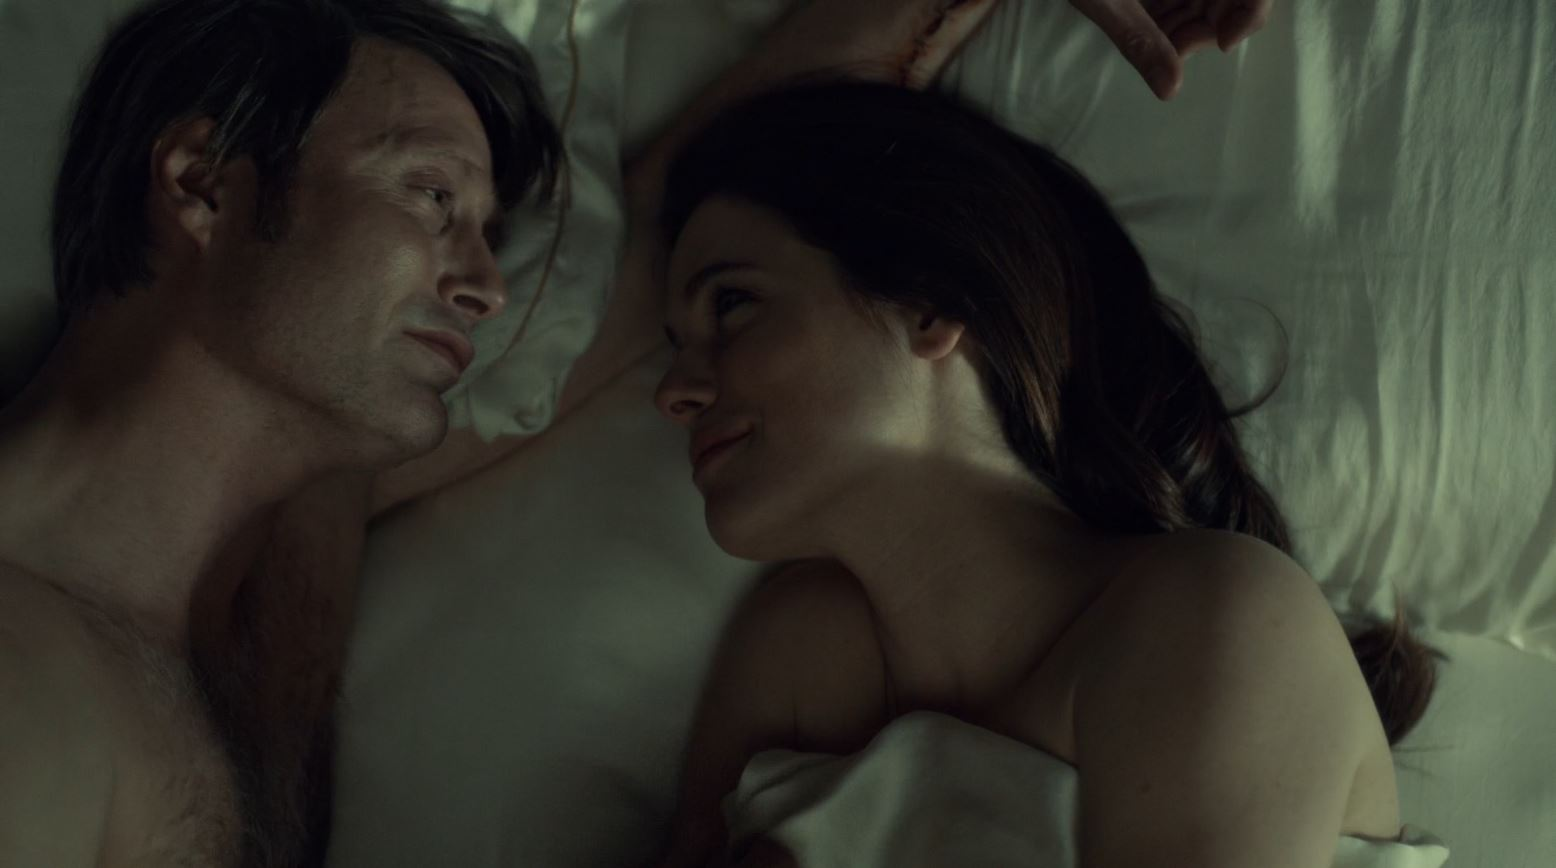 Hannibal S2Ep6 Futamono Review - Hannibal and Alana having sex